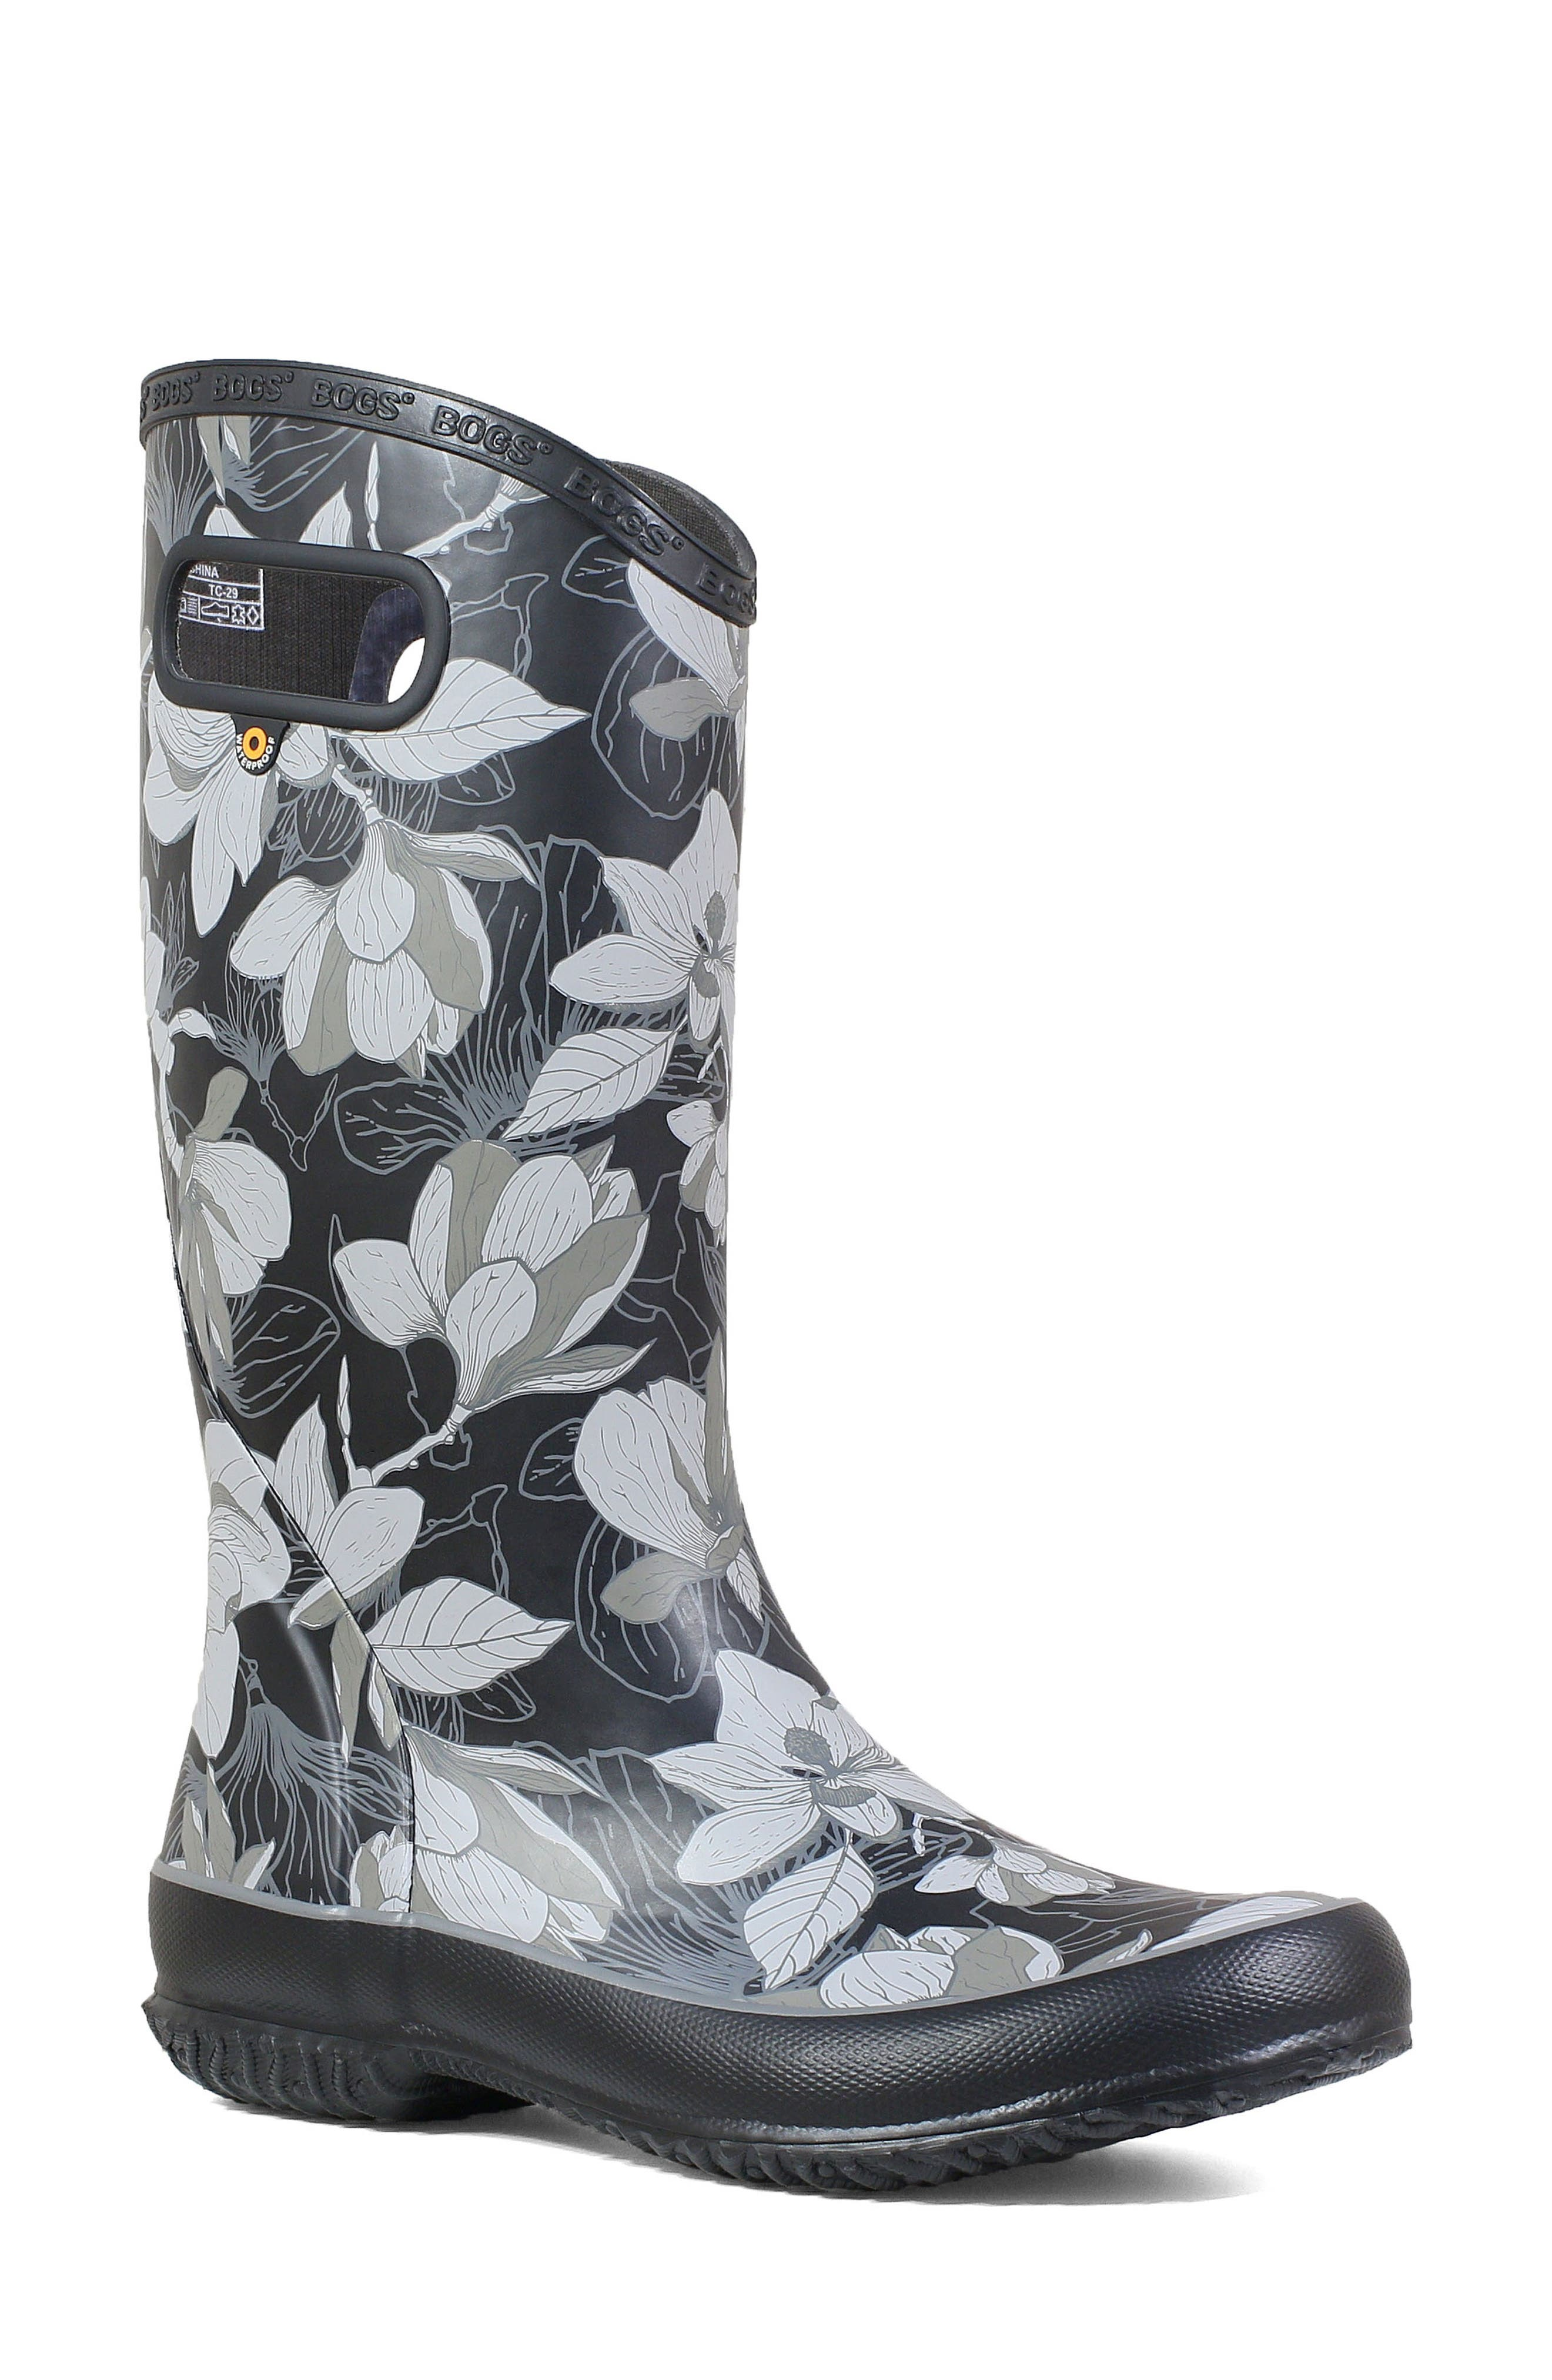 Bogs Classic Tall Waterproof Rain Boot, Black